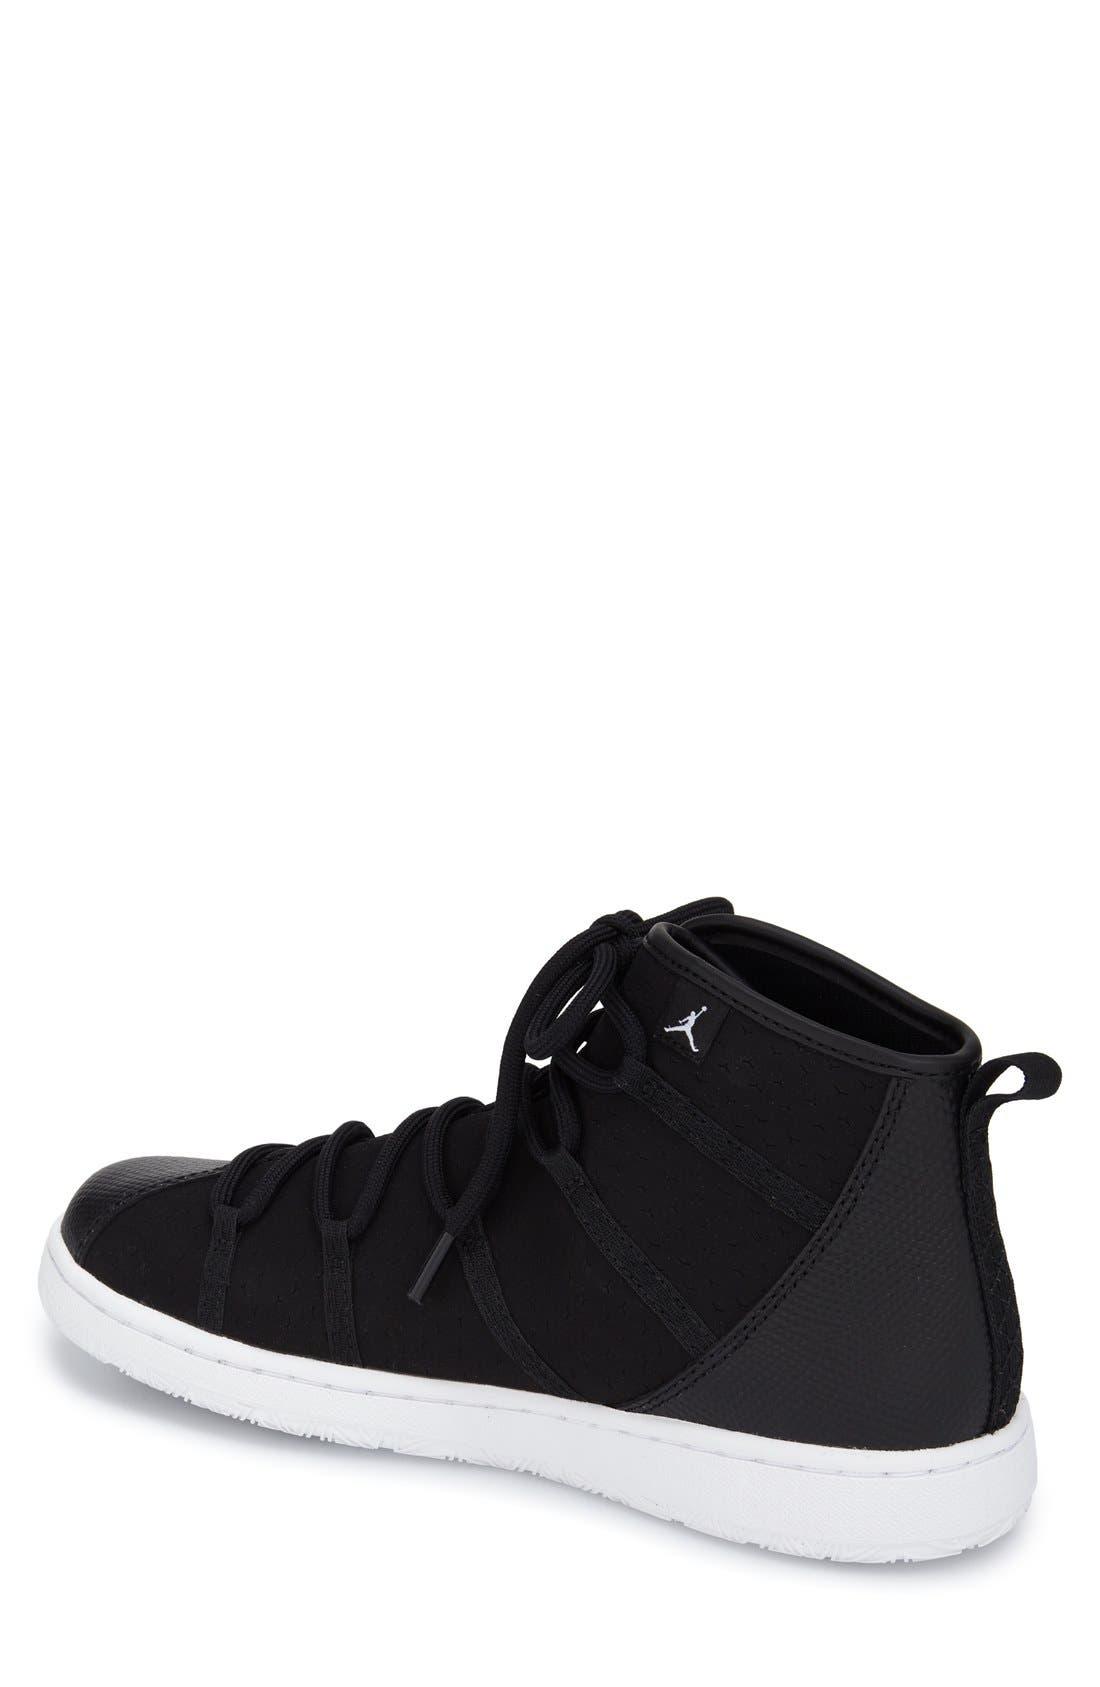 Jordan Galaxy' Sneaker,                             Alternate thumbnail 2, color,                             010